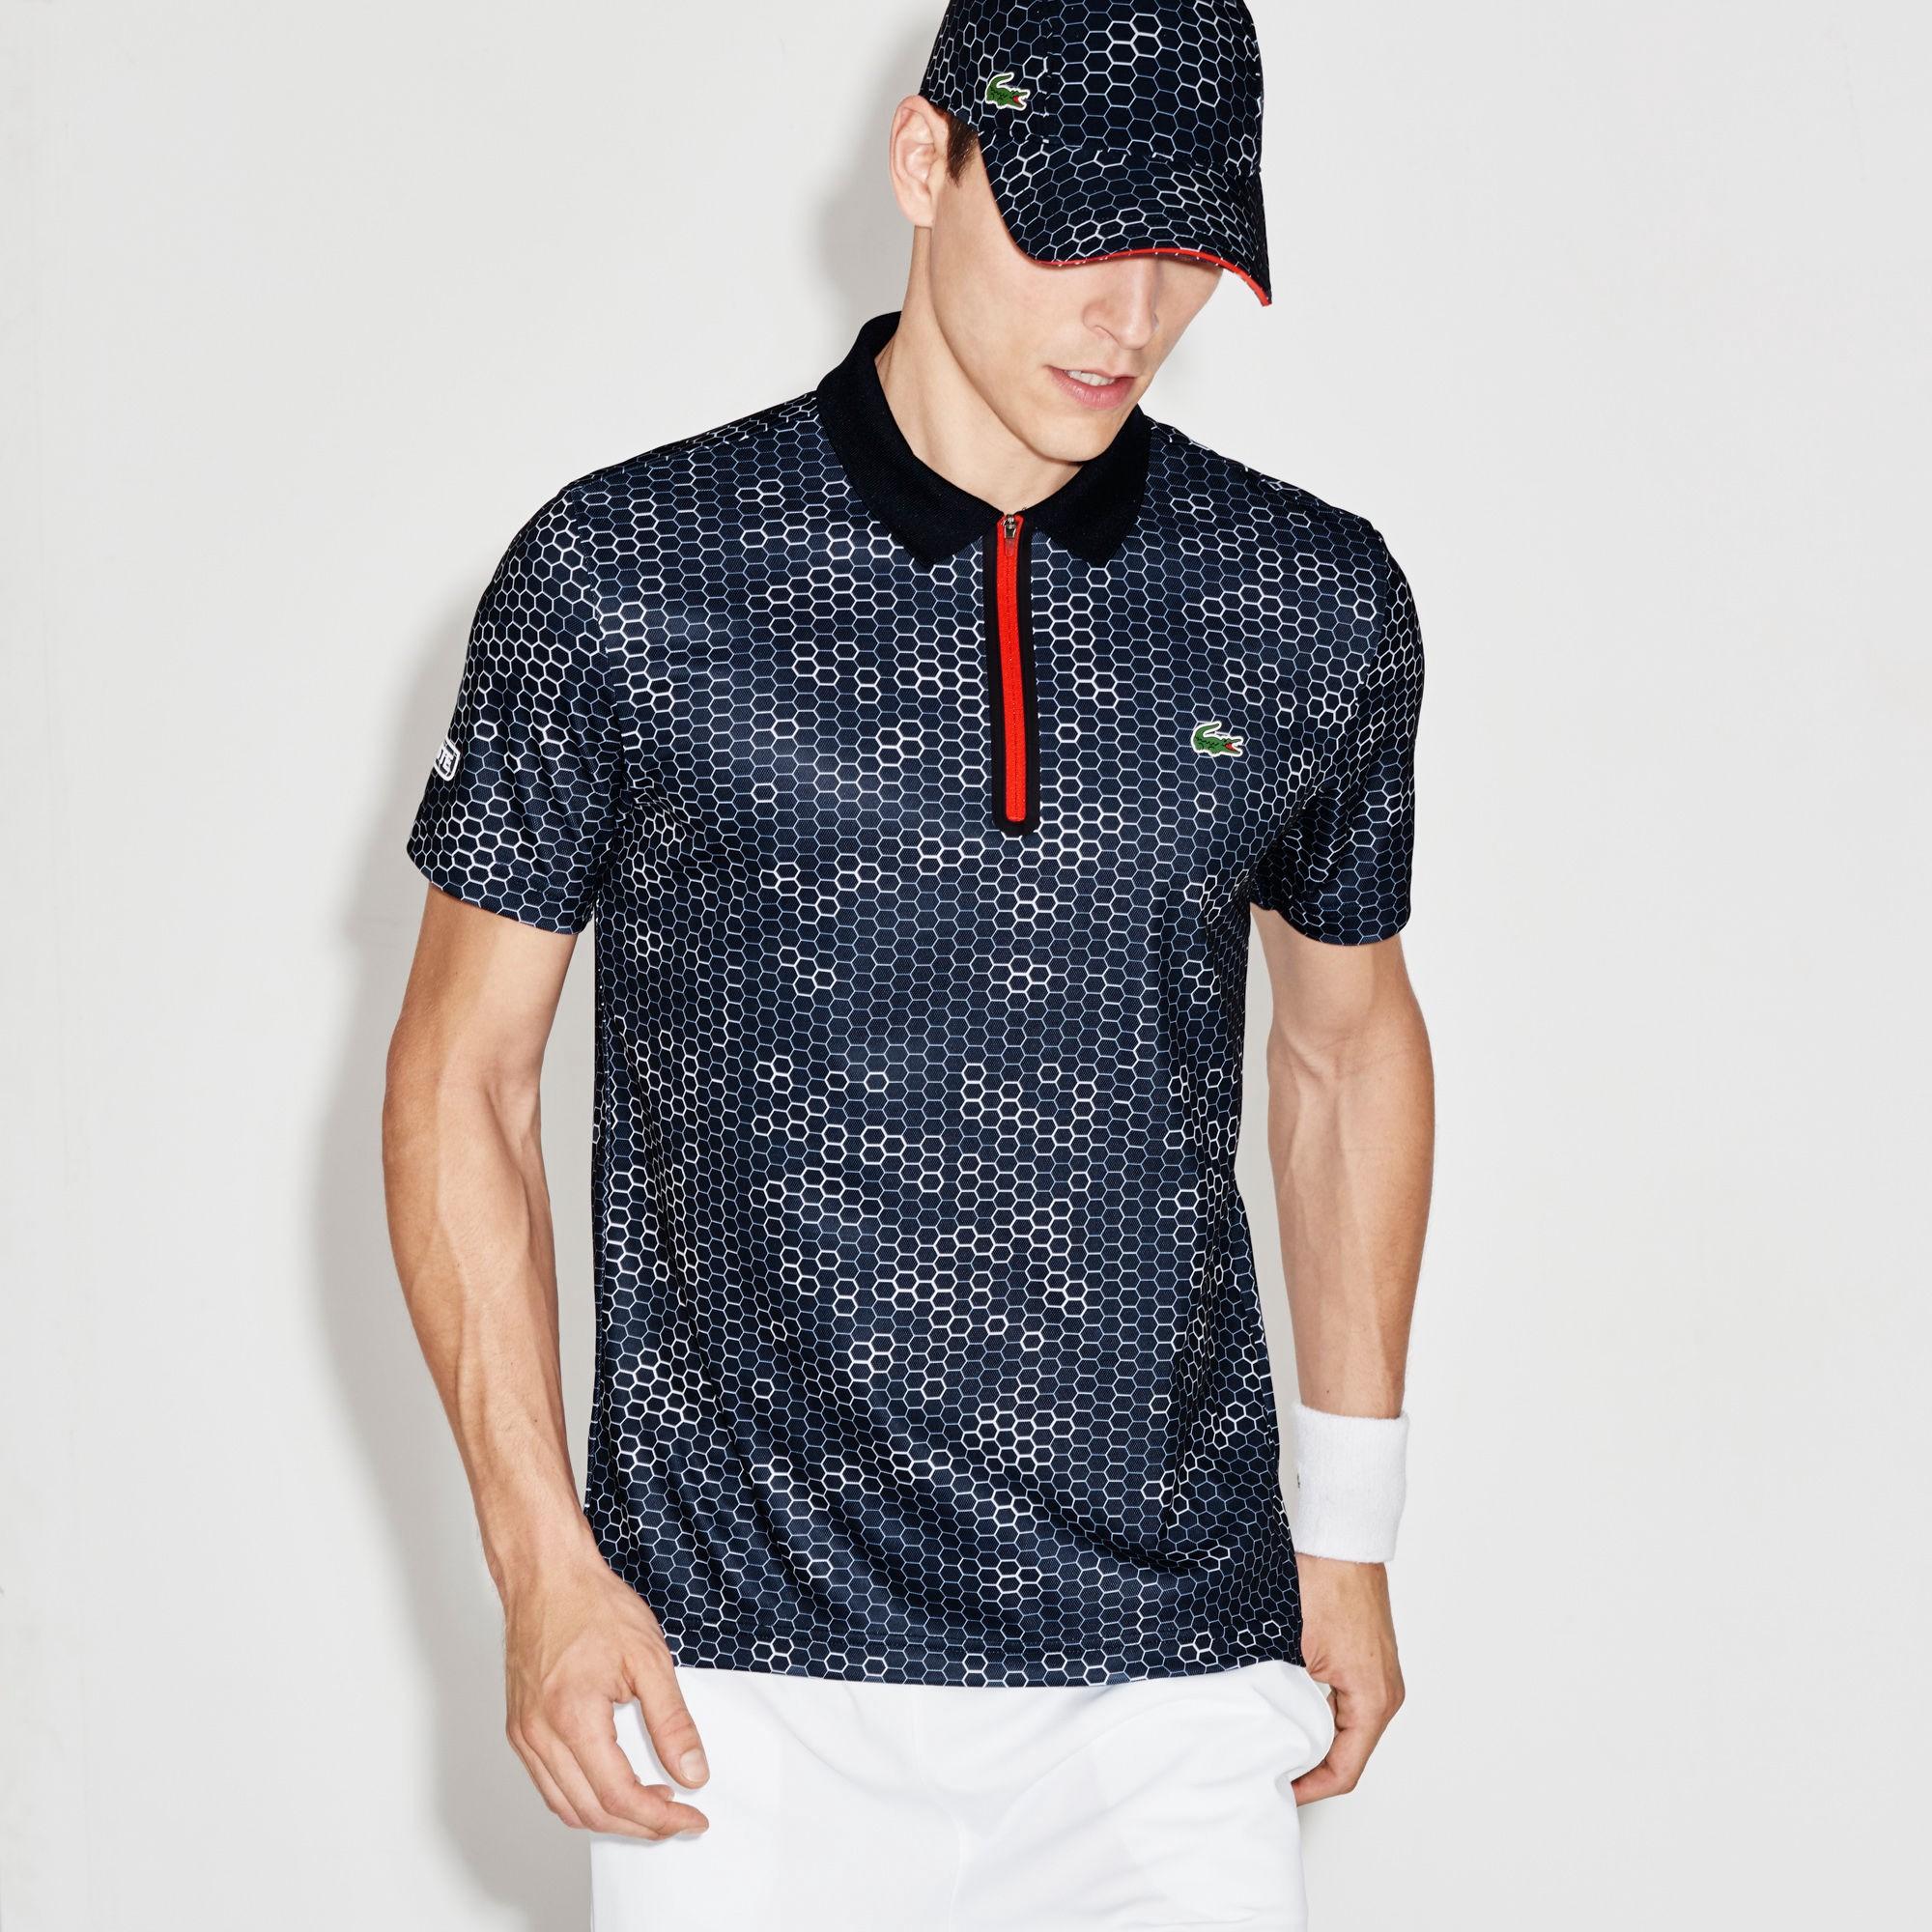 402497b4e Lacoste Men s Sport Ultra Dry Zip Tennis Polo - Navy Blue White-Corrida